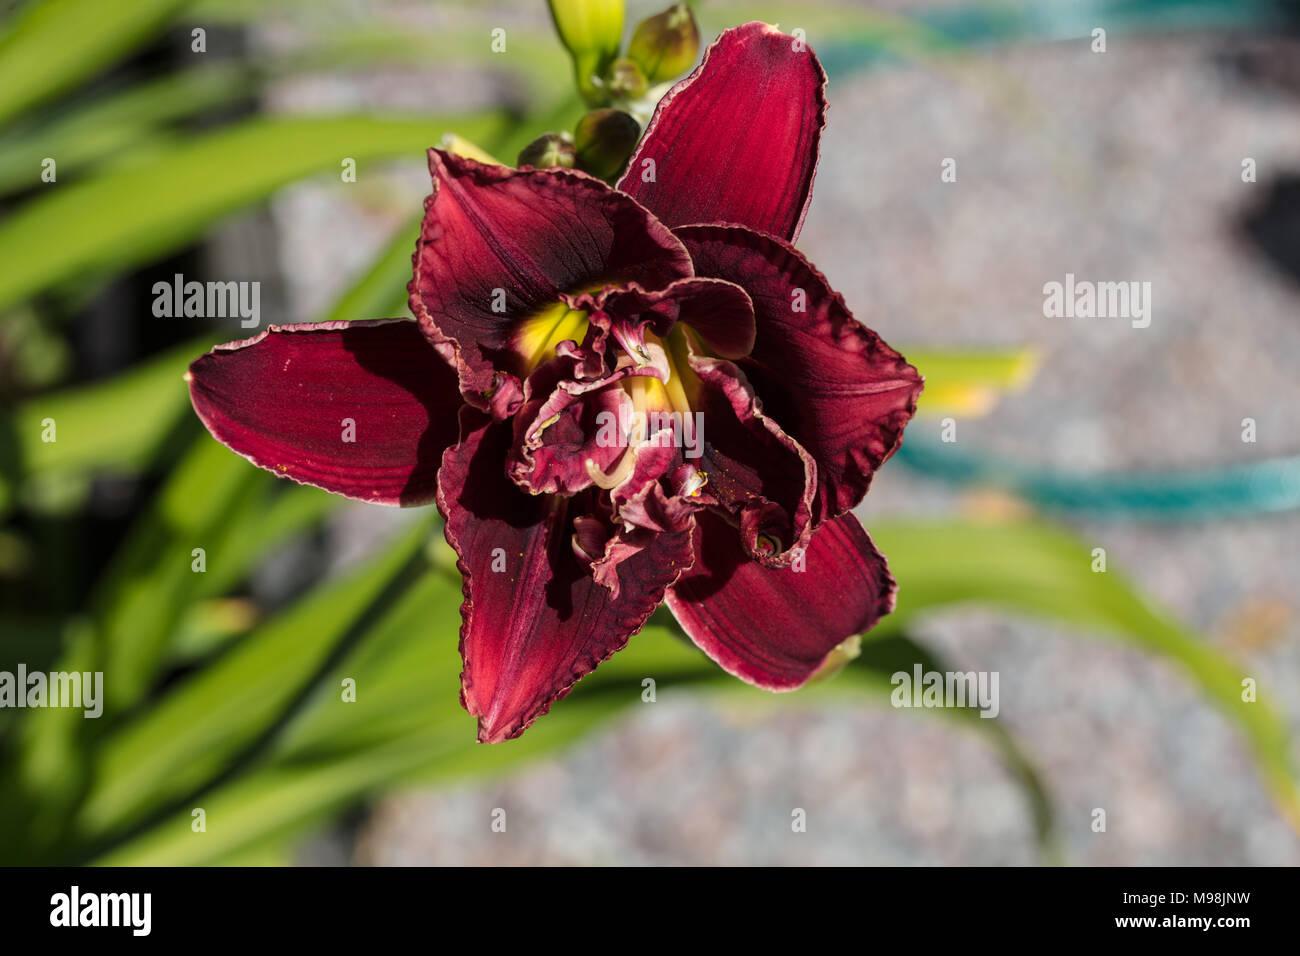 'Stellar Double Rose' Daylily, Daglilja (Hemerocallis) Stock Photo